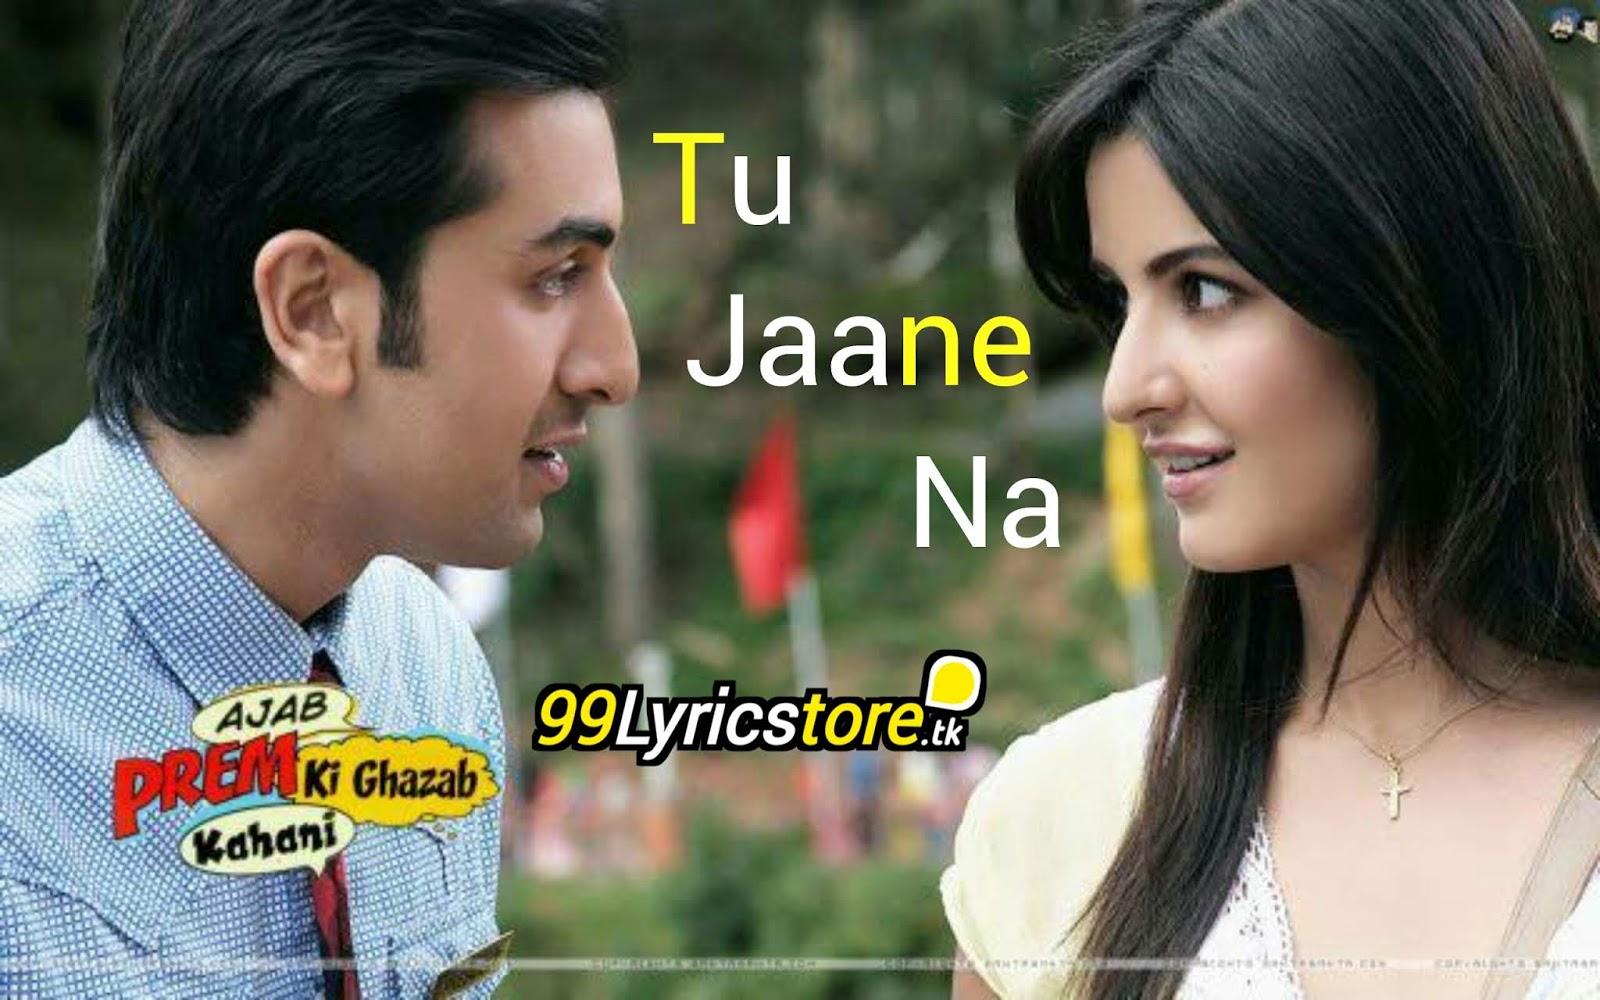 Atif Aslam hit Song Lyrics, Ranbir Kapoor Song Lyrics, Katrina Kaif Song Lyrics